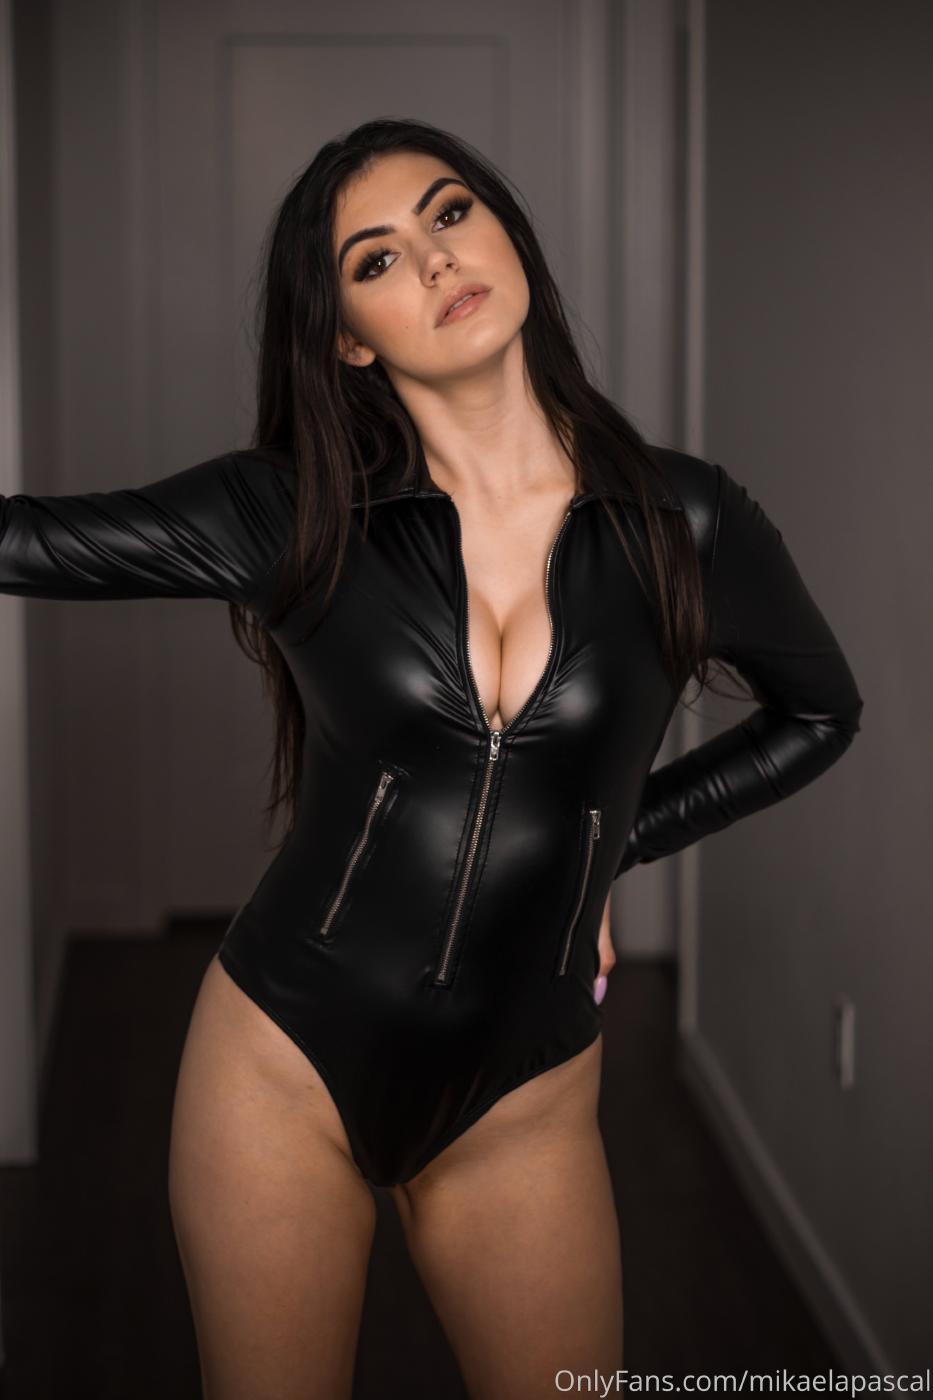 Mikaela Pascal Sexy Leather Bodysuit Onlyfans Set Leaked 0011